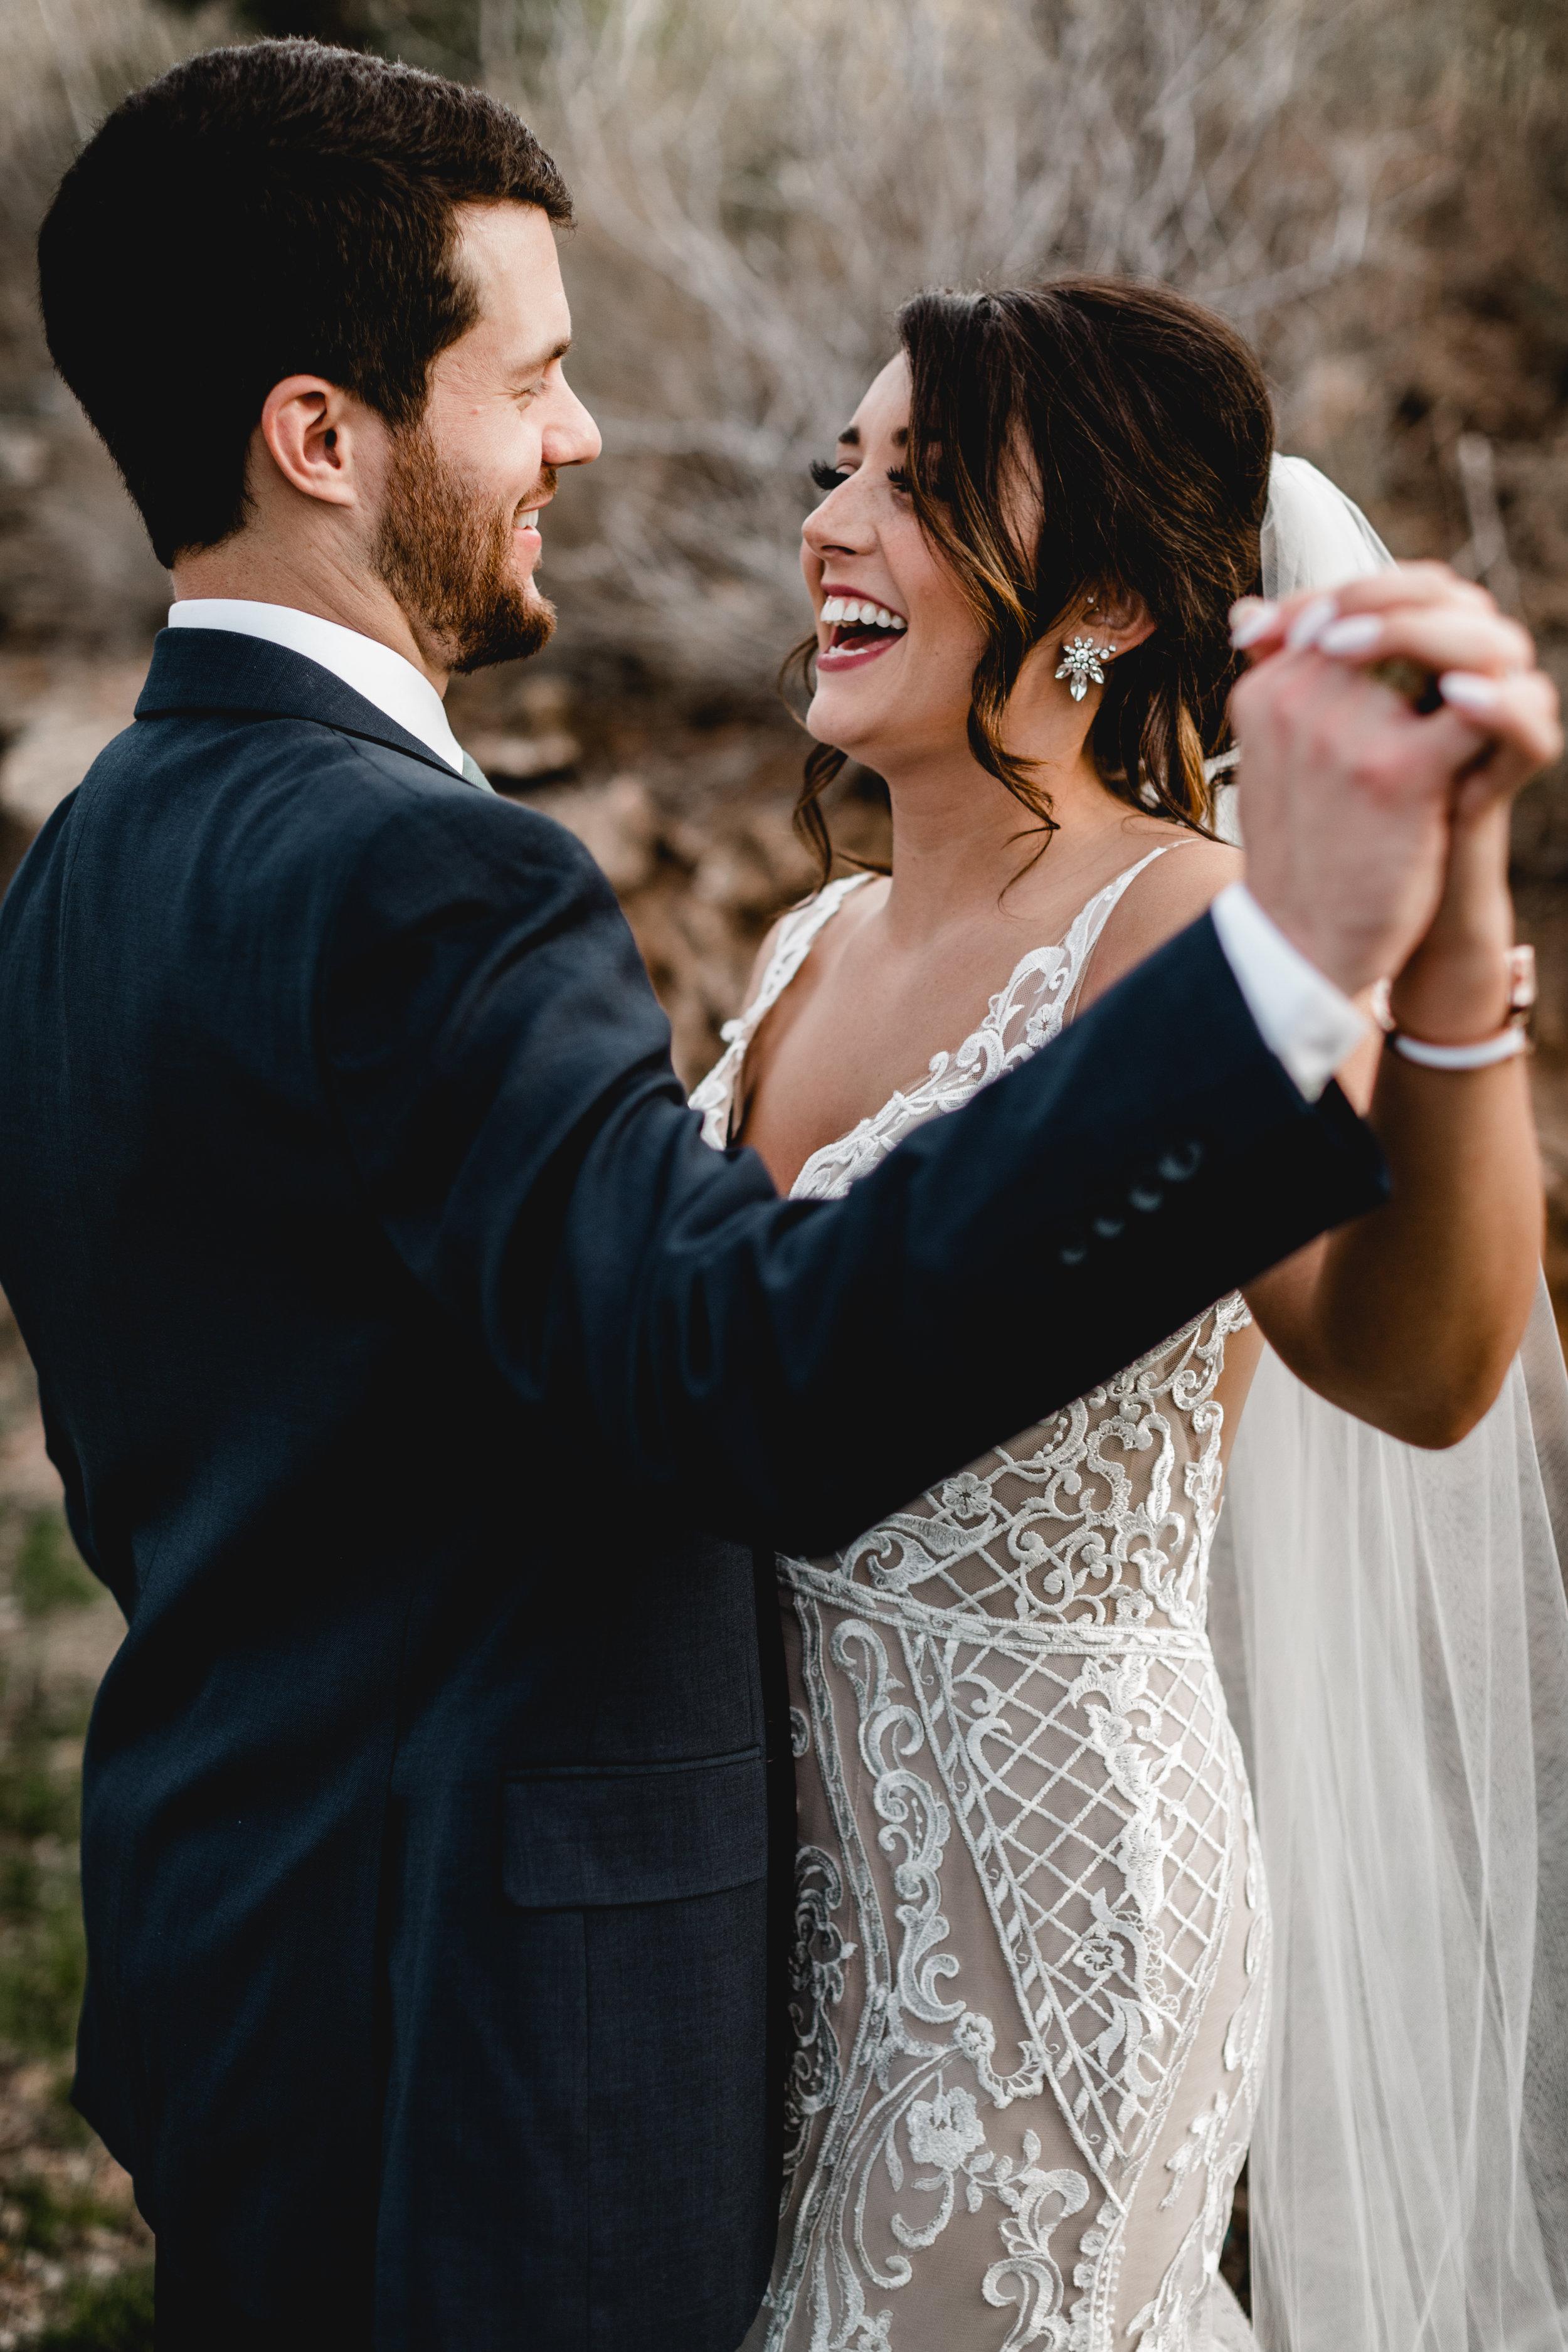 Newlyweds-51.jpg